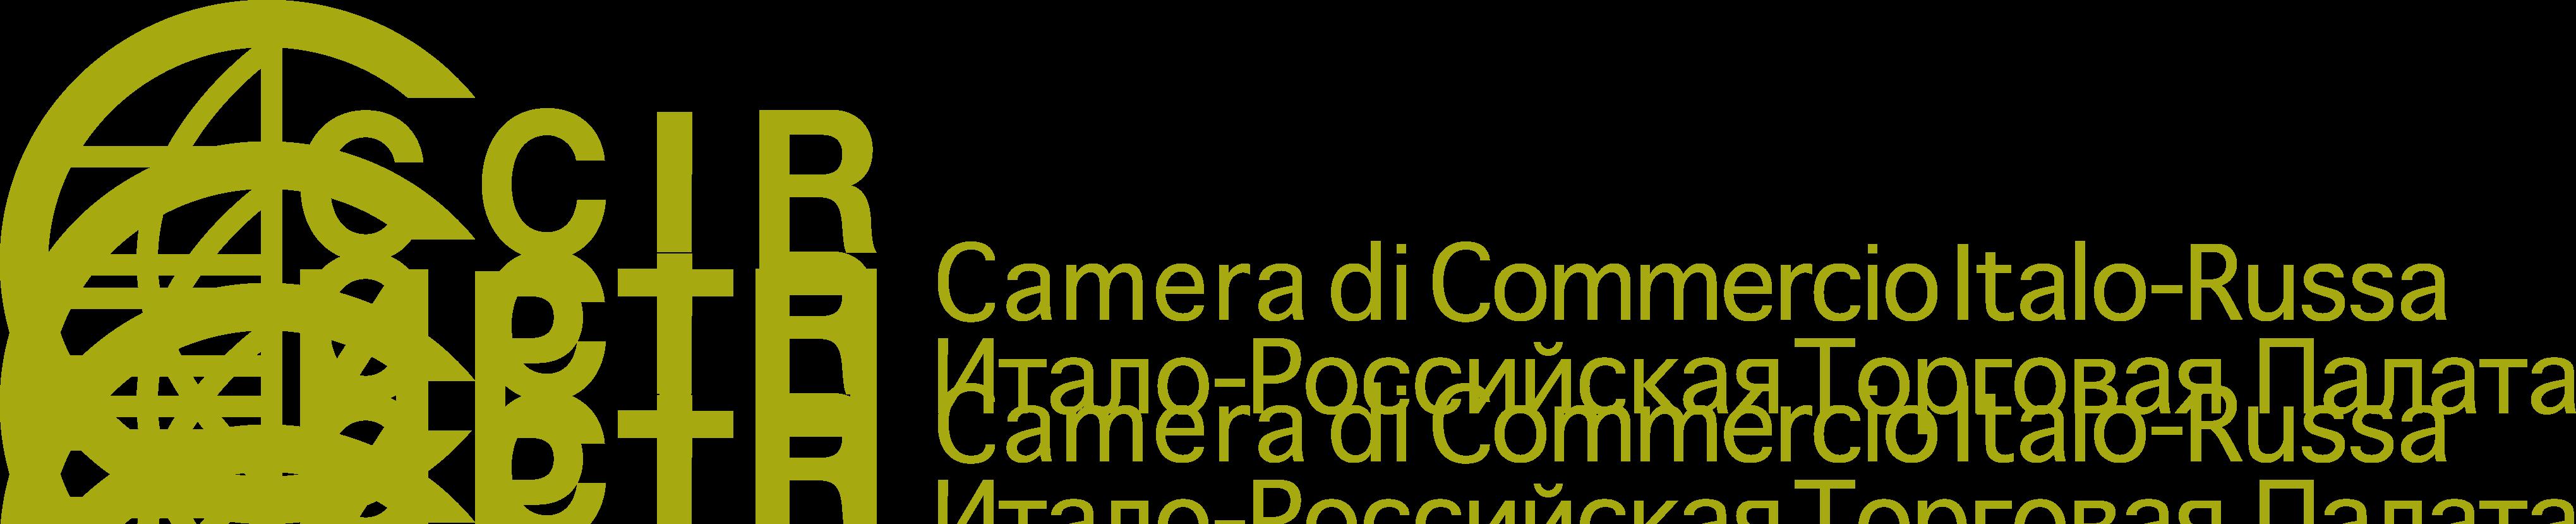 CCIR logo